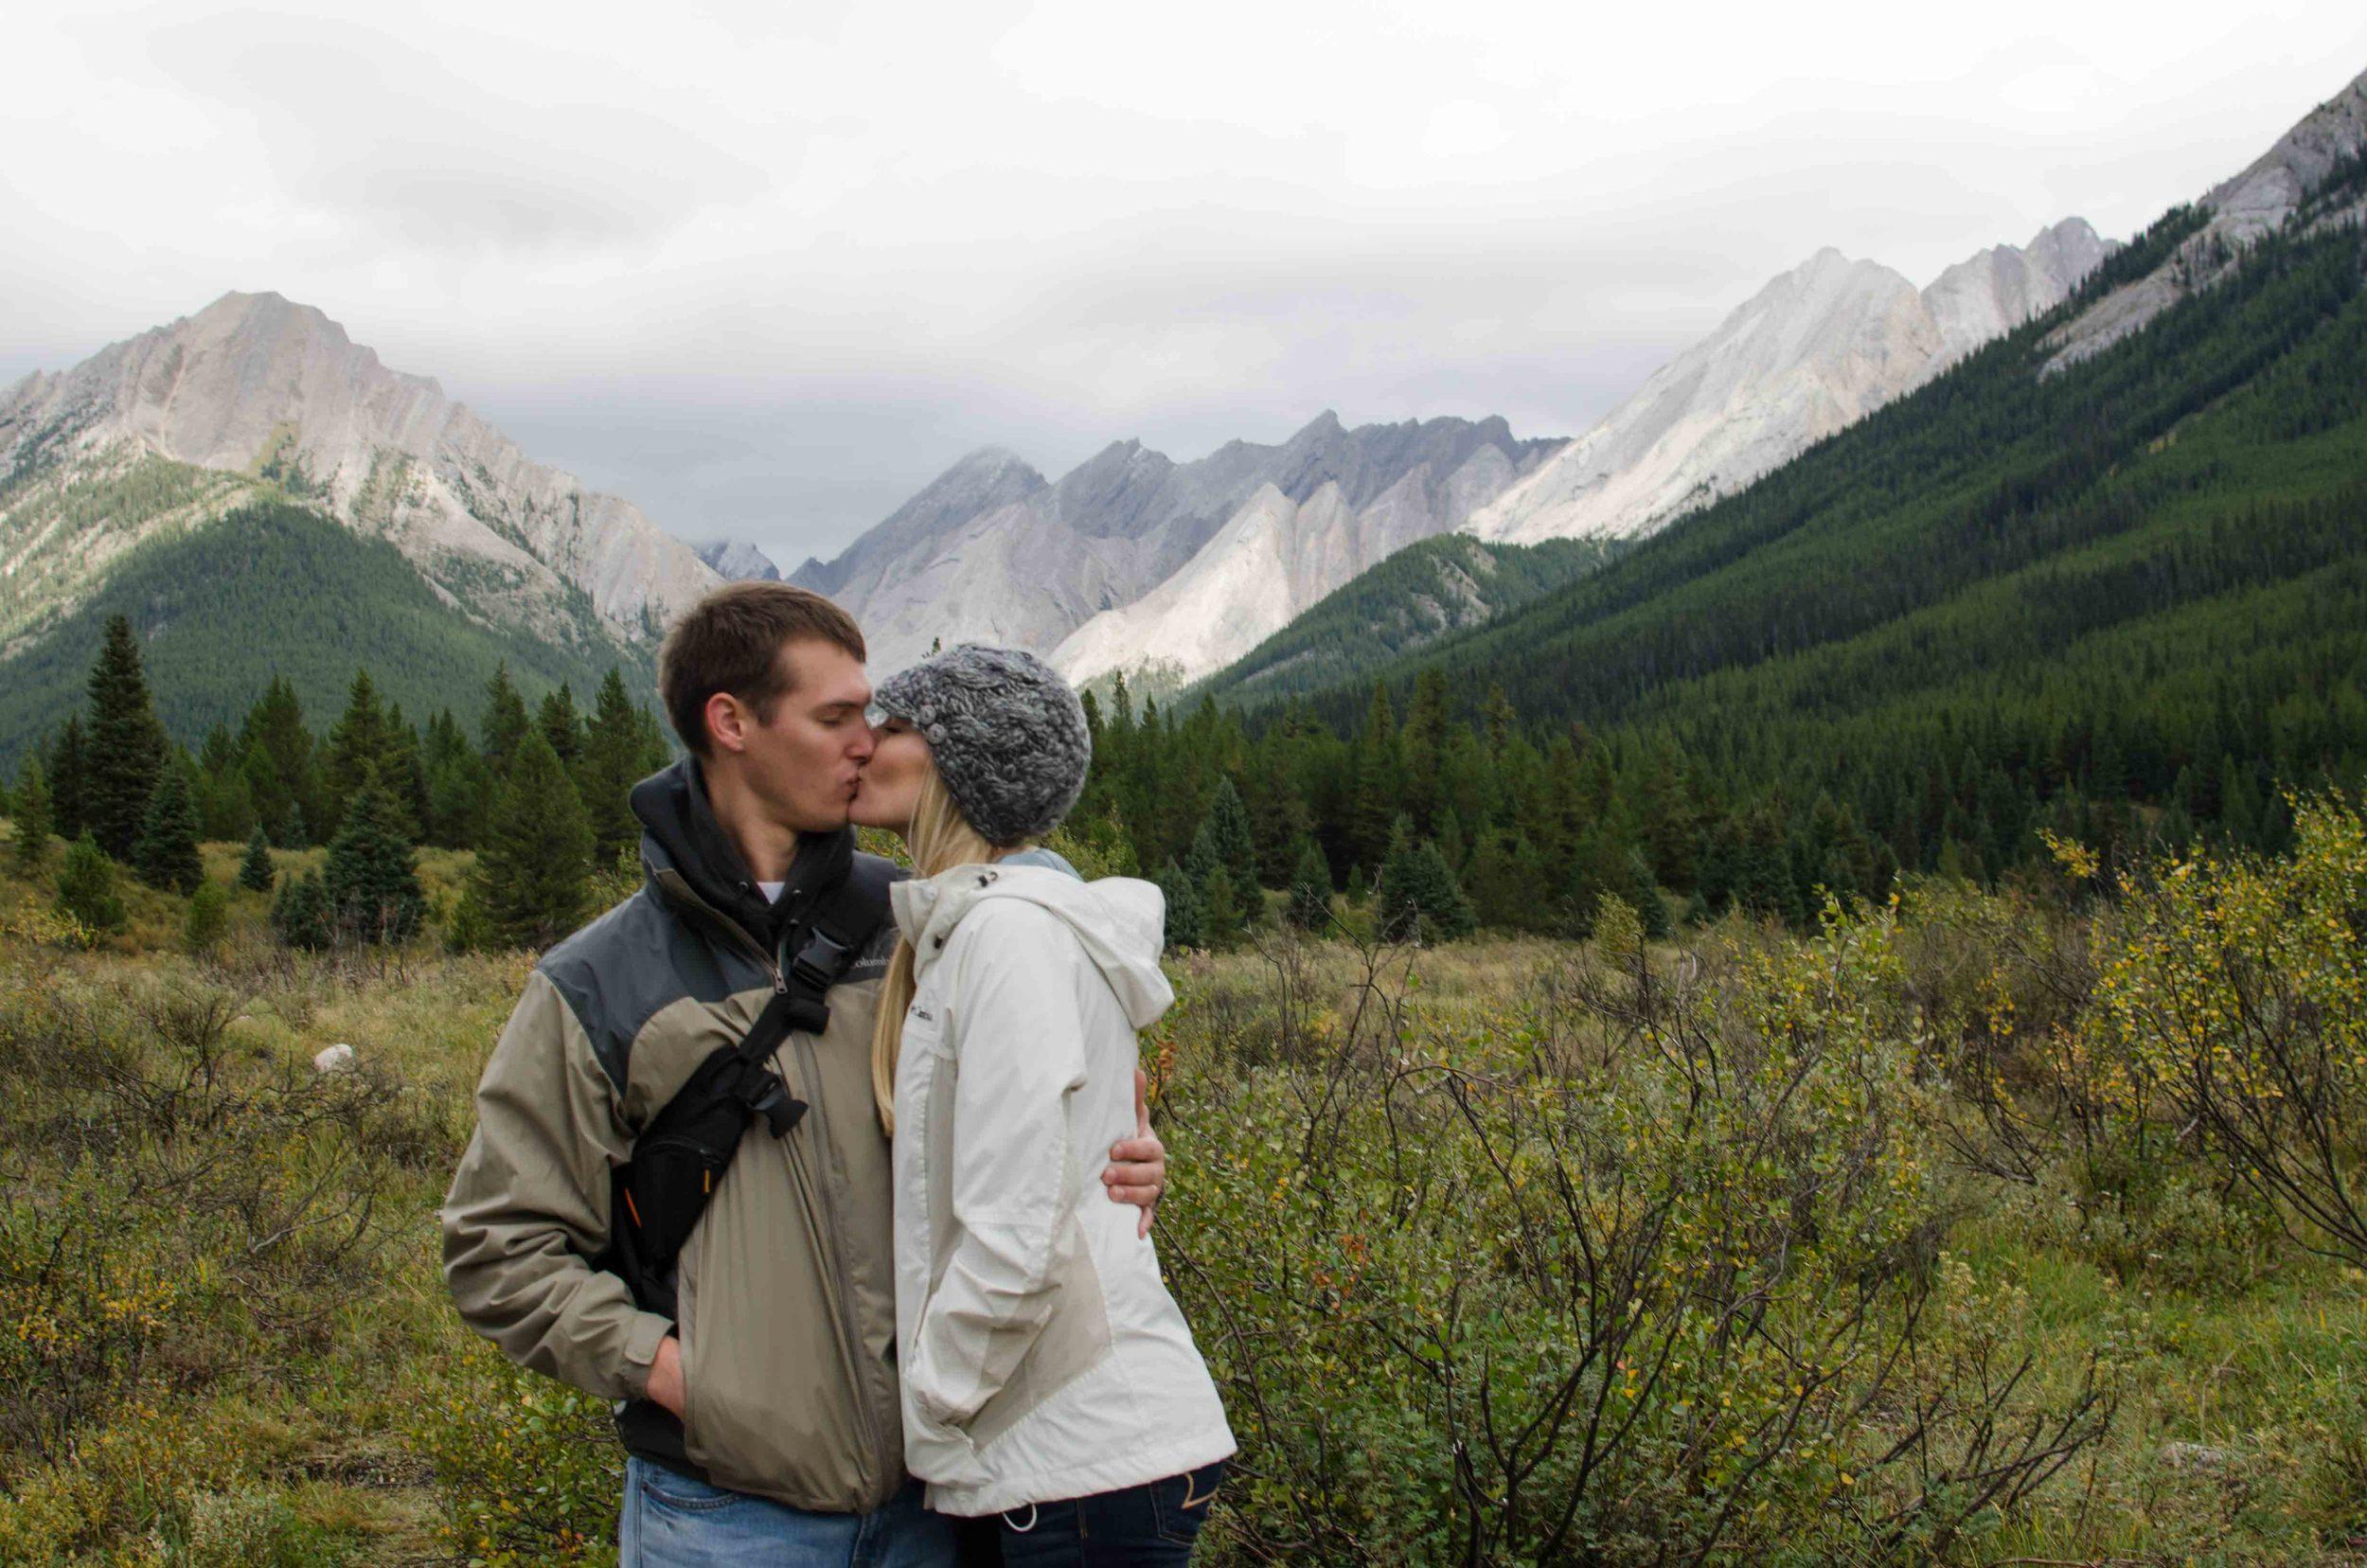 Banff-Inkpots-Hike-Kiss-Mountains-Canada.jpg